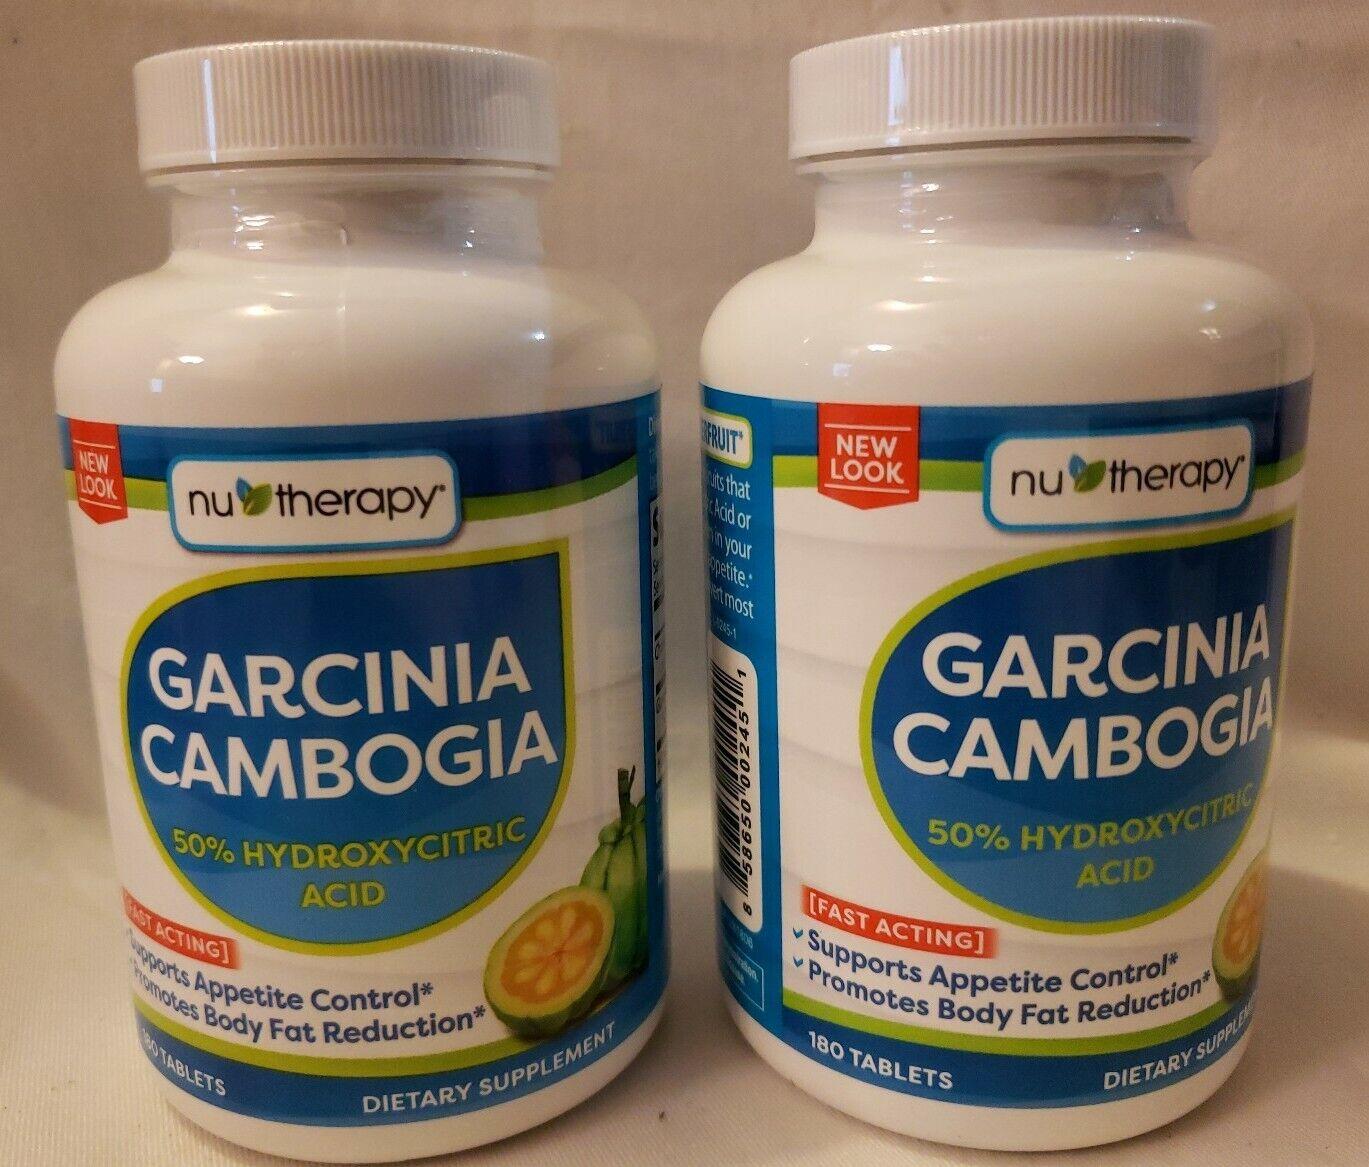 nu therapy garcinia cambogia 50 hydroxycitric acid reviews